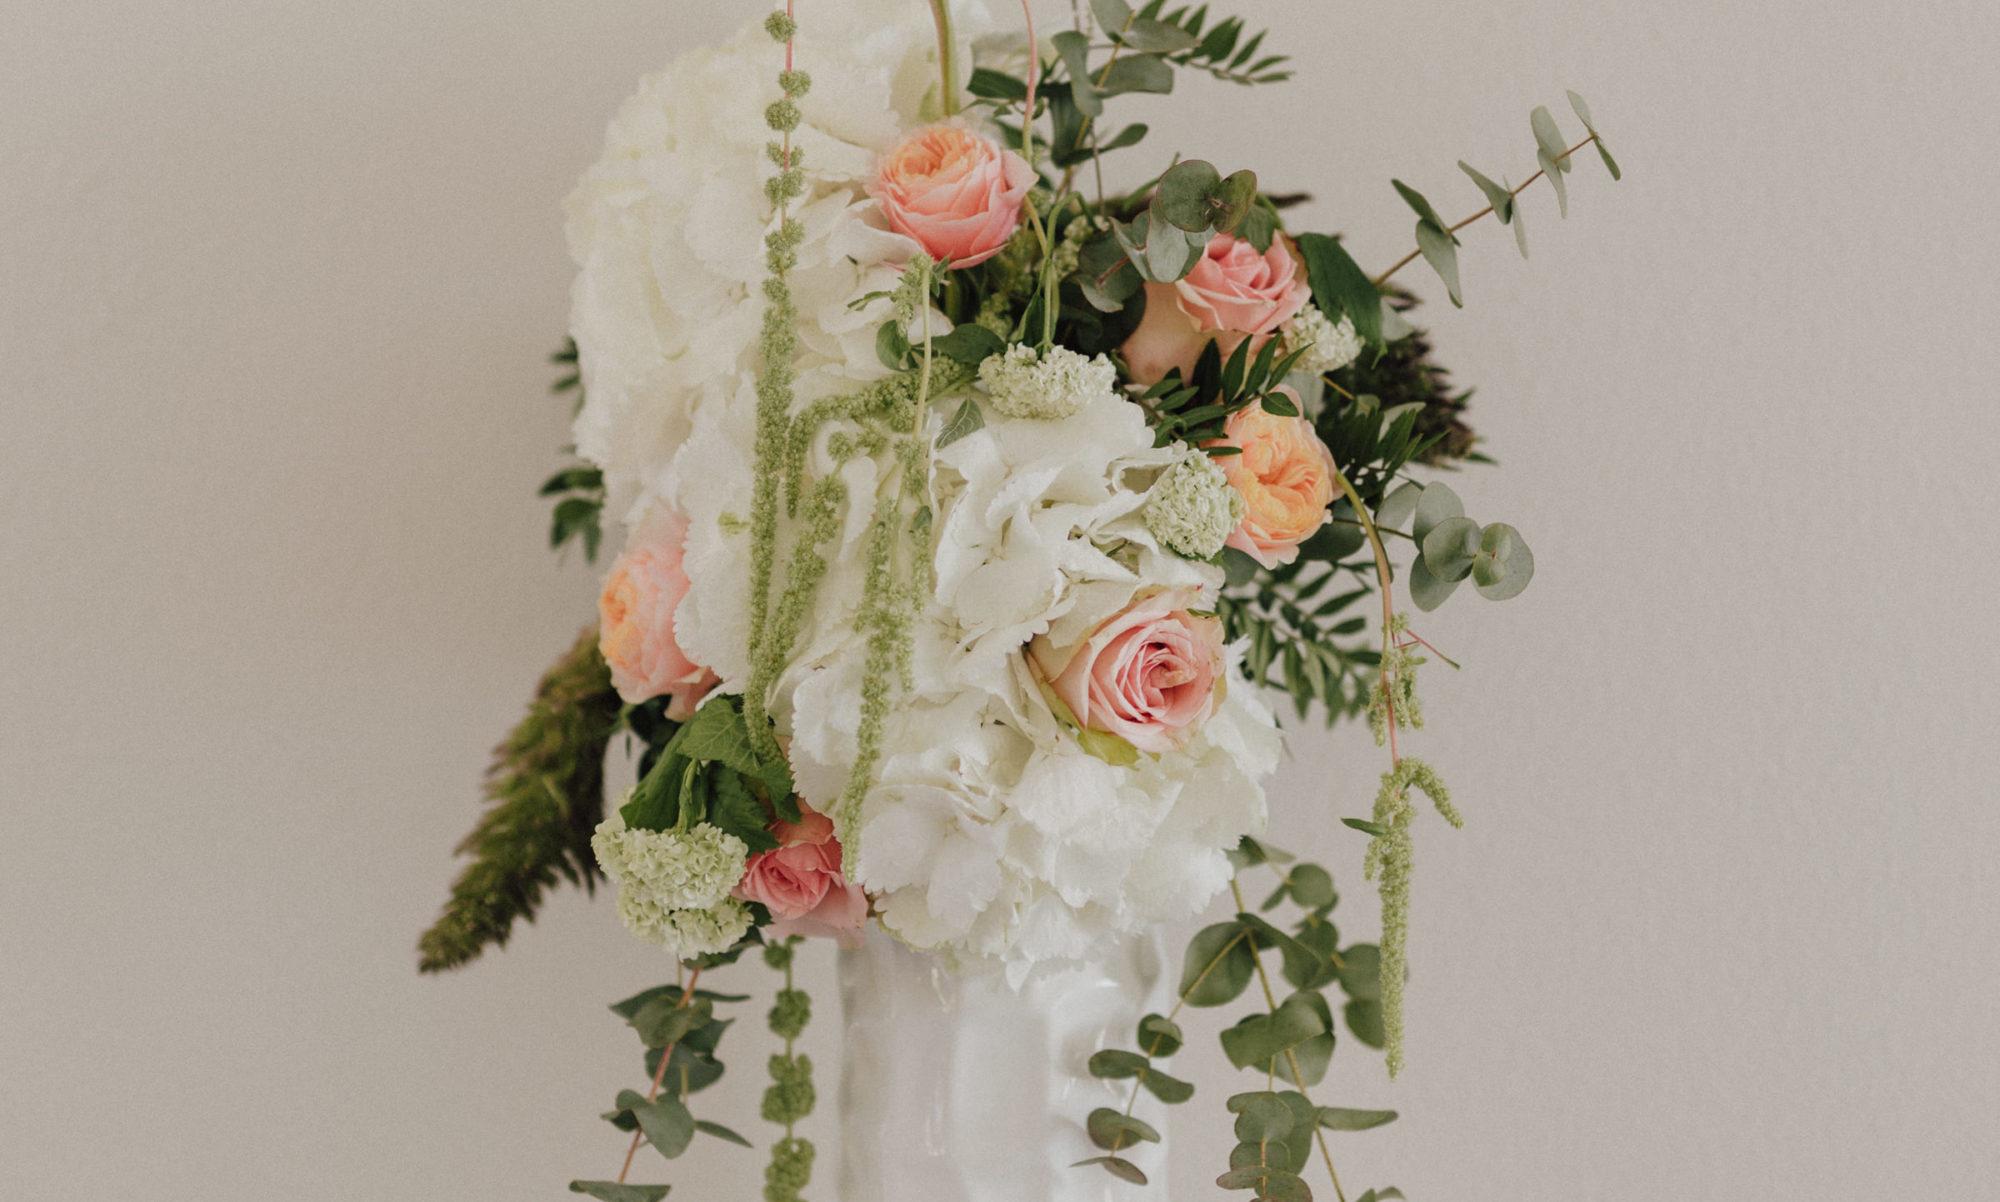 L'atelier Julie Bihler- fleuriste